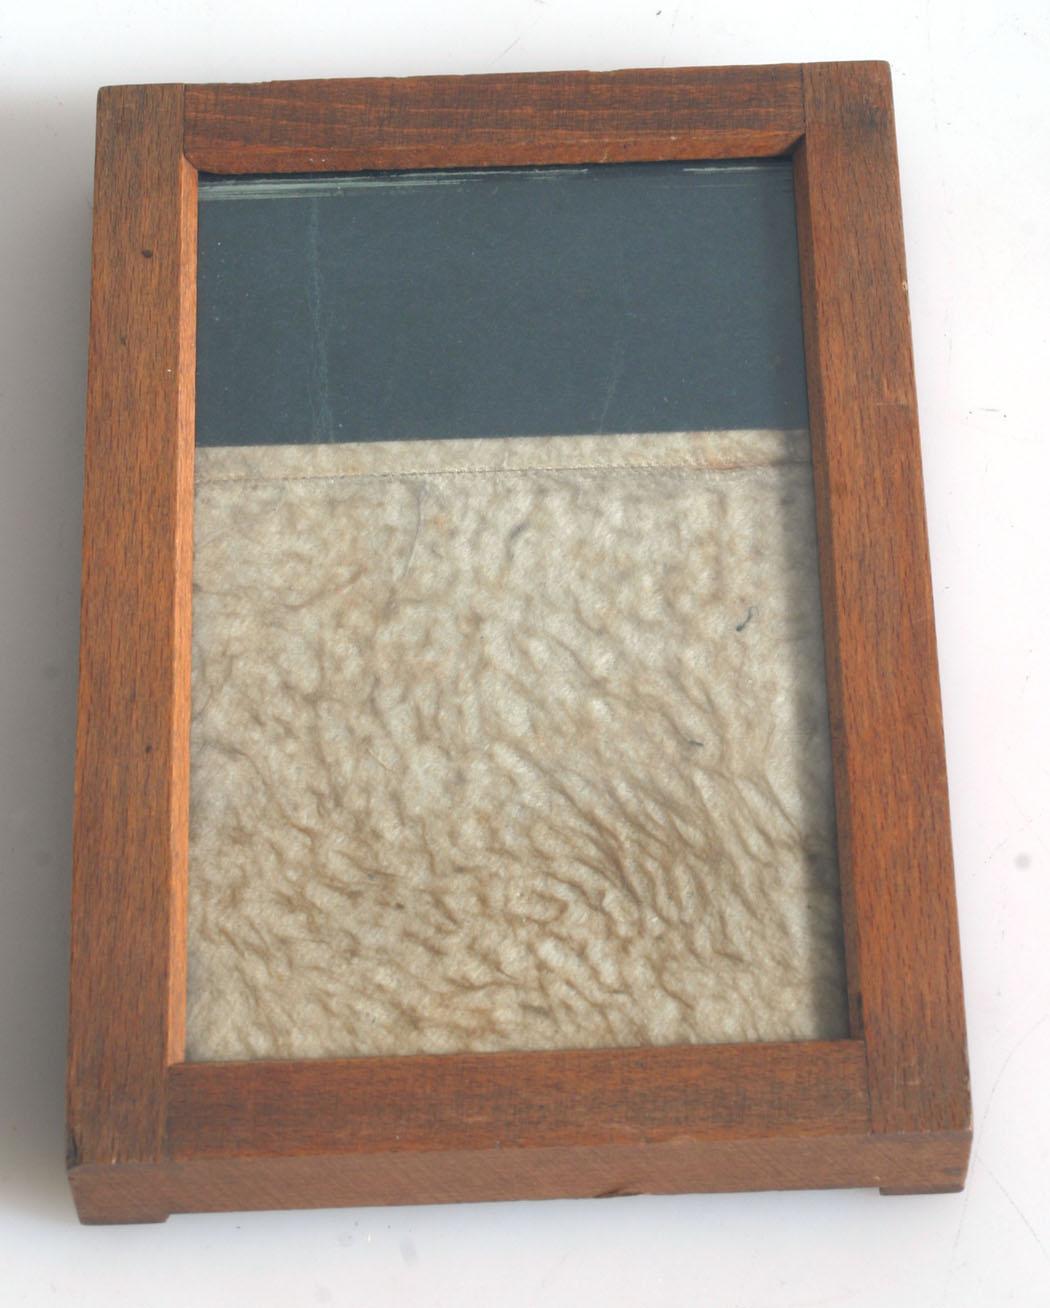 3 1/4 X 5 1/2 EASTMAN KODAK CONTACT PRINTING FRAME VINTAGE WOODEN | eBay